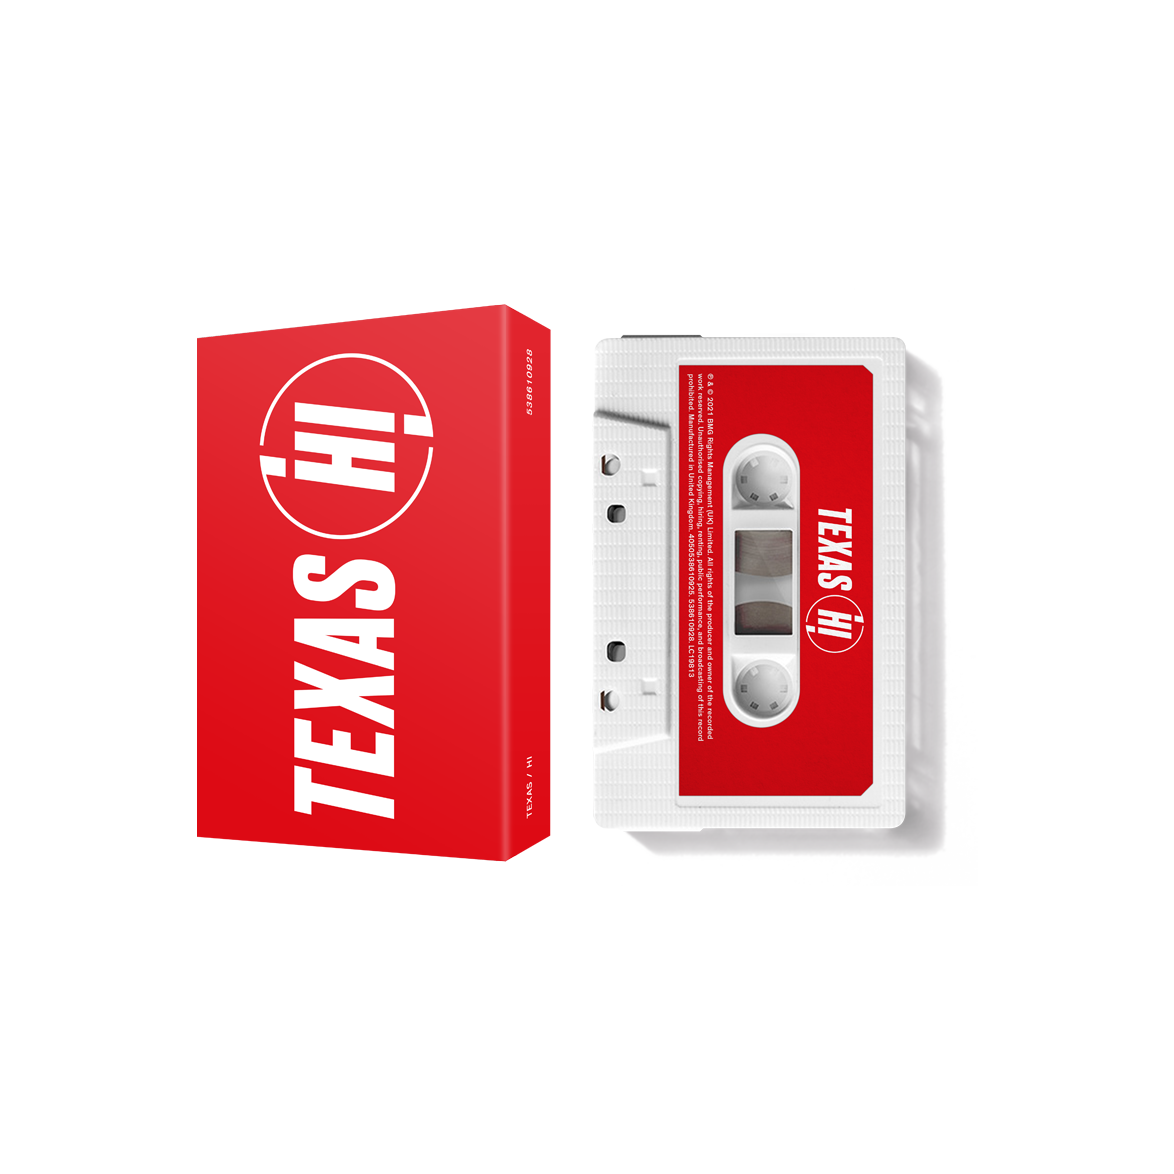 Buy Online Texas - Hi Cassette